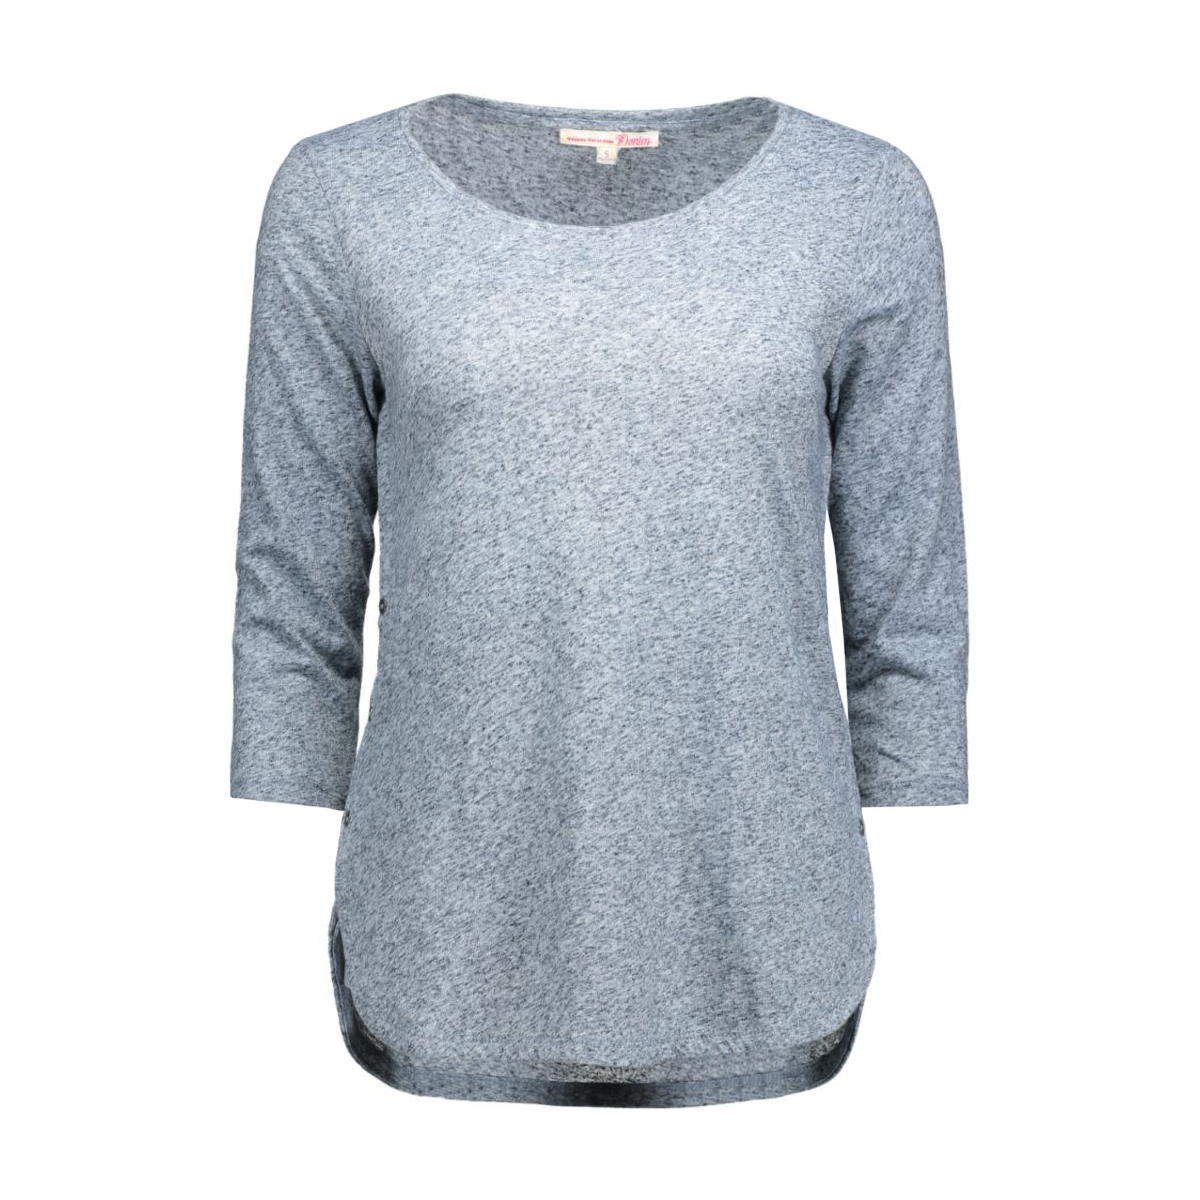 1035778.00.71 tom tailor t-shirt 6160